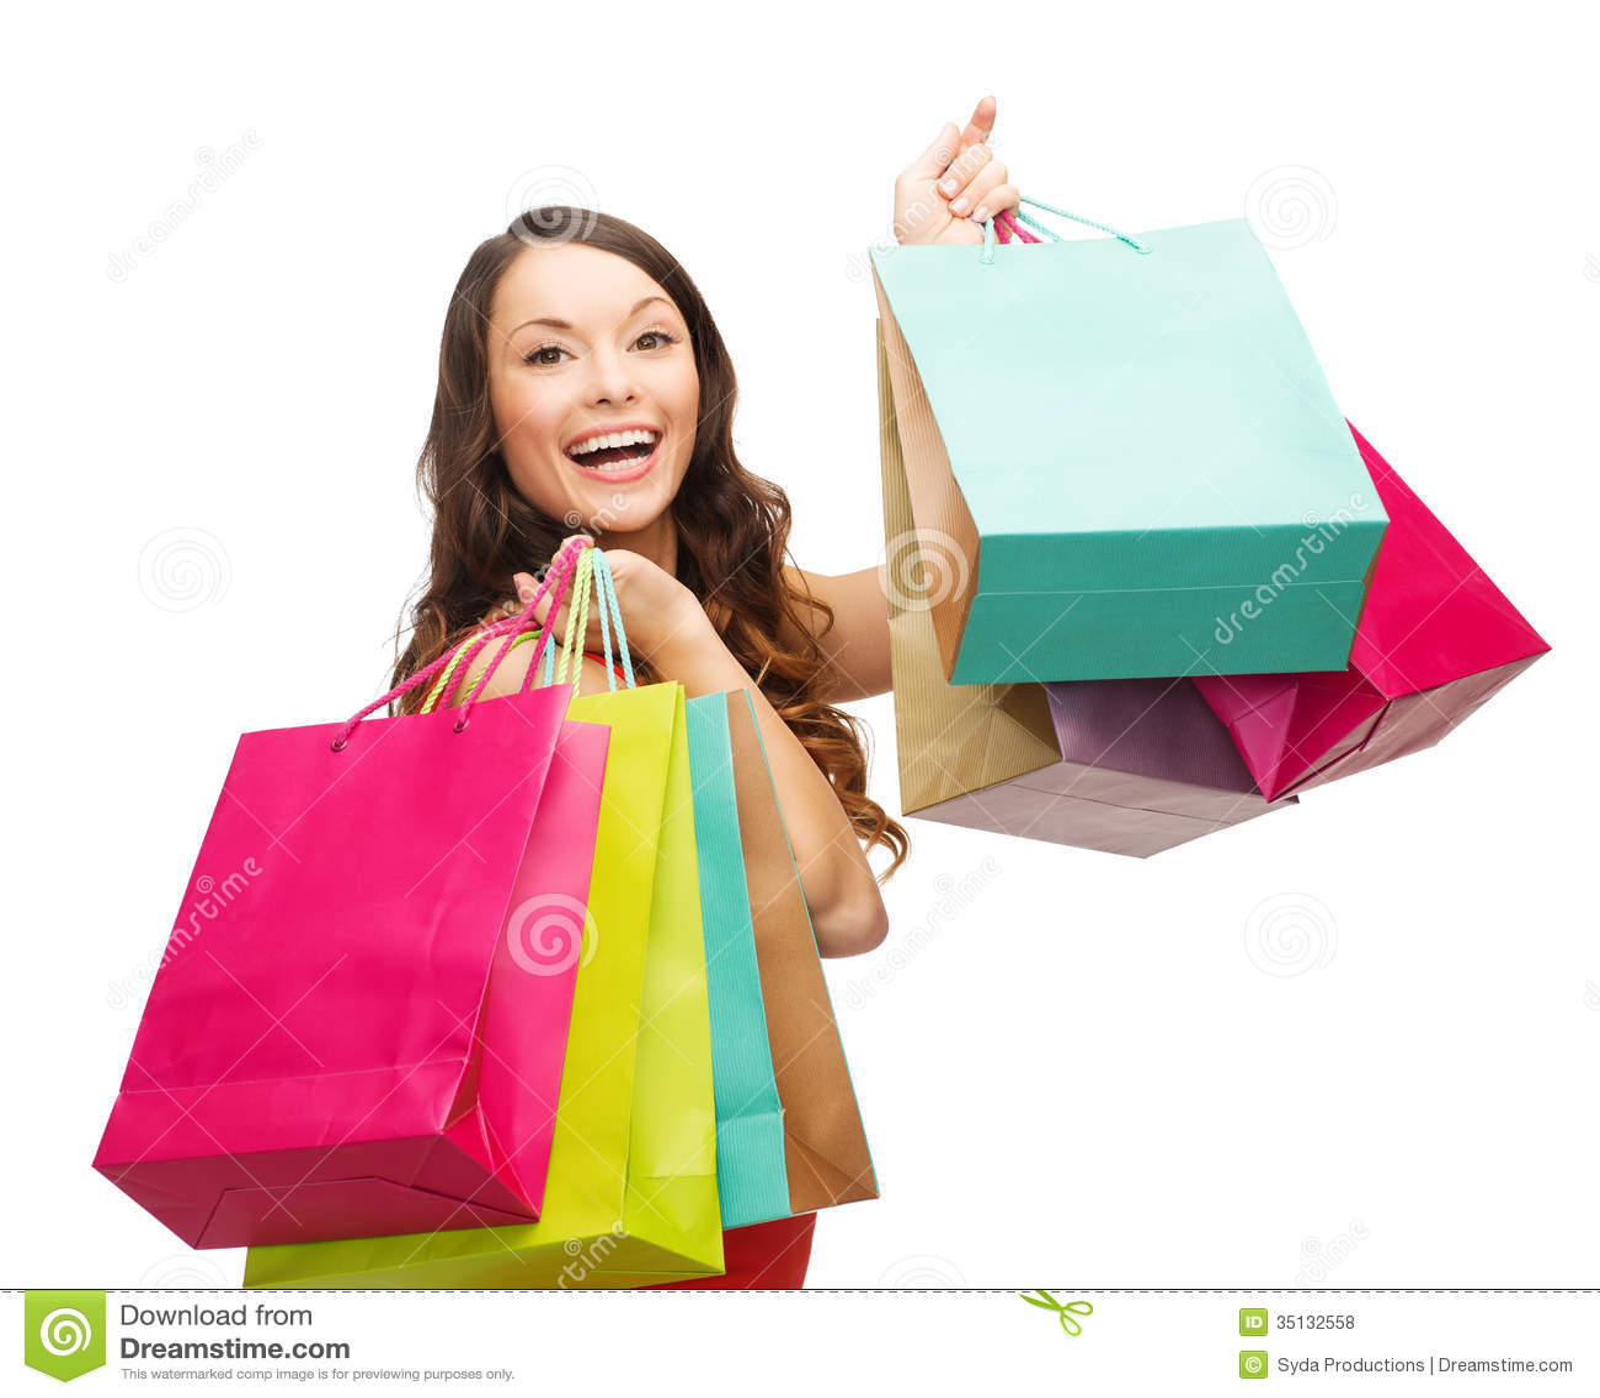 Handbag Sales. Purse Shopping in Washington